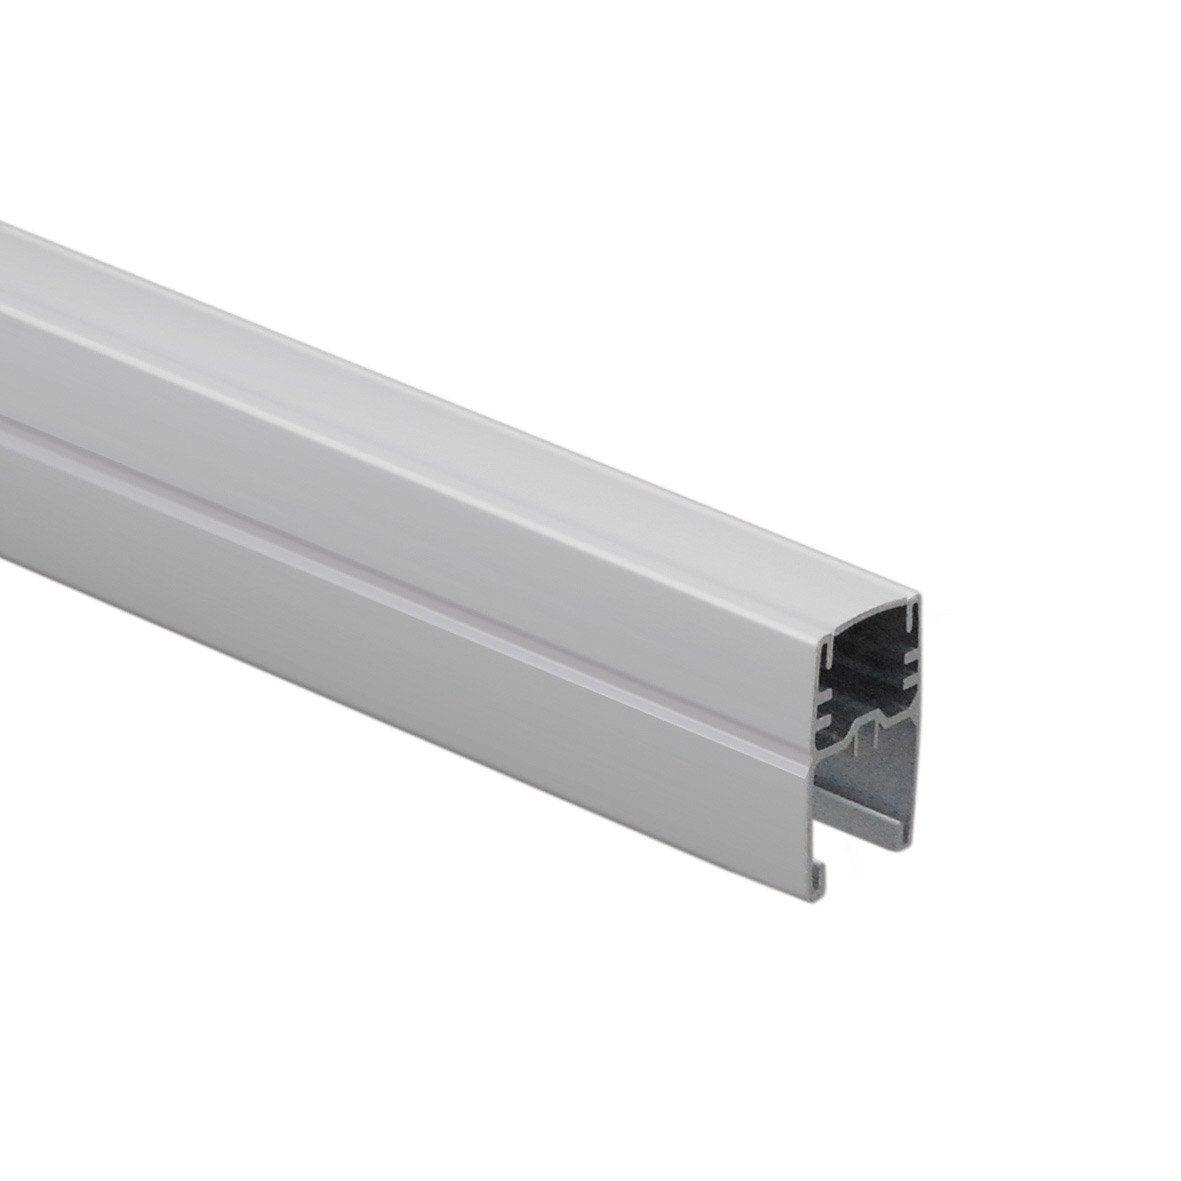 Profil de finition aluminium en h premium blanc h 4 5 x x p 3 4 cm leroy merlin for Palissade aluminium prix